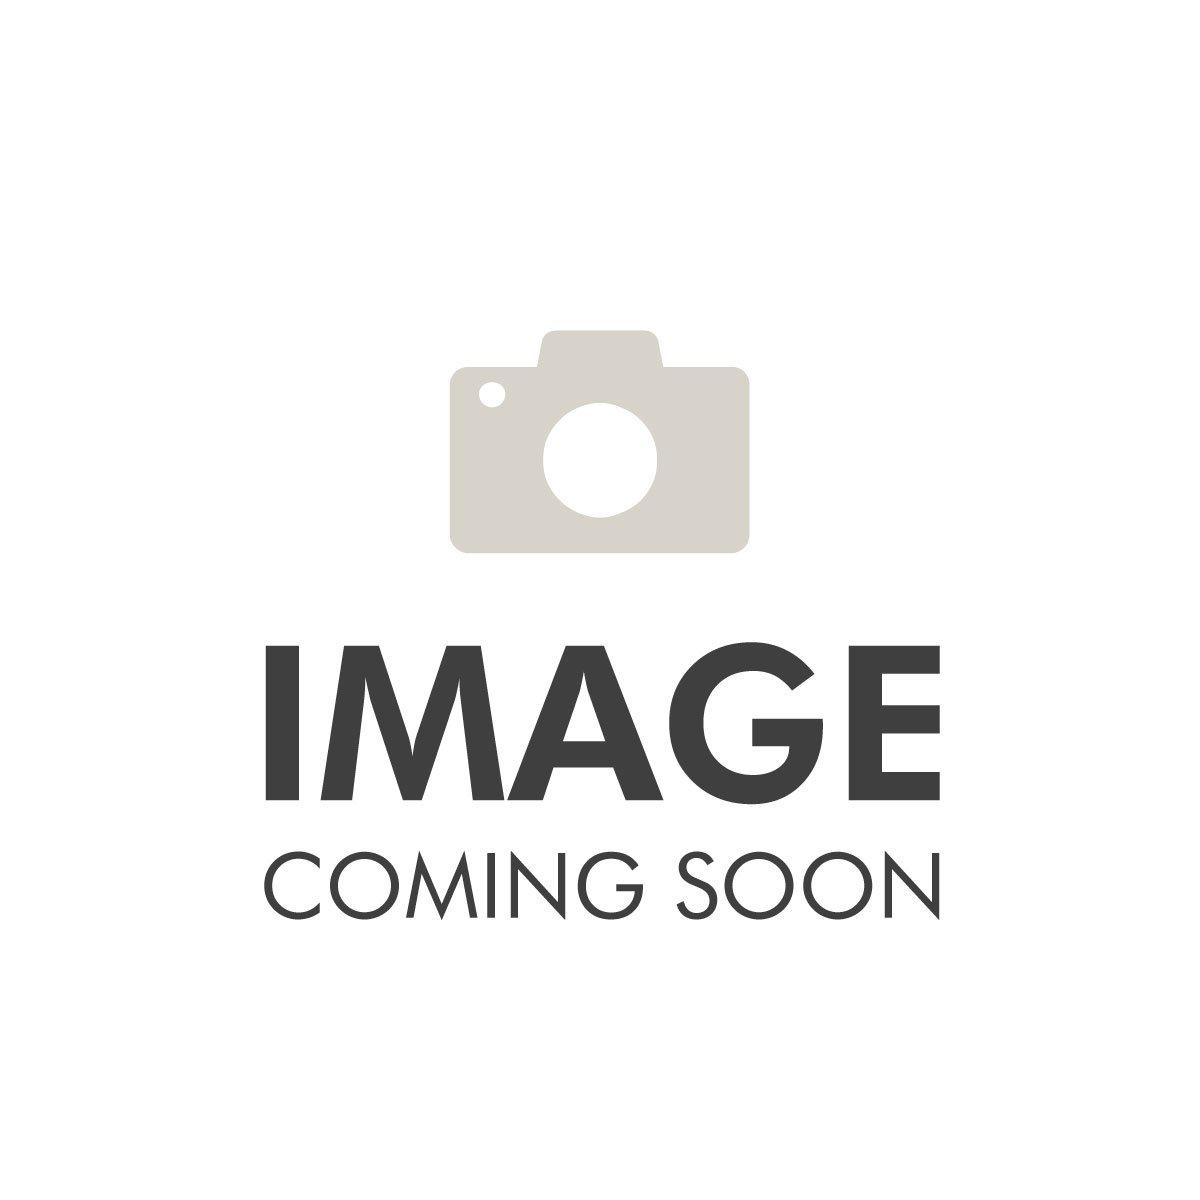 Leon Paul - Coquille de fleuret - Titane